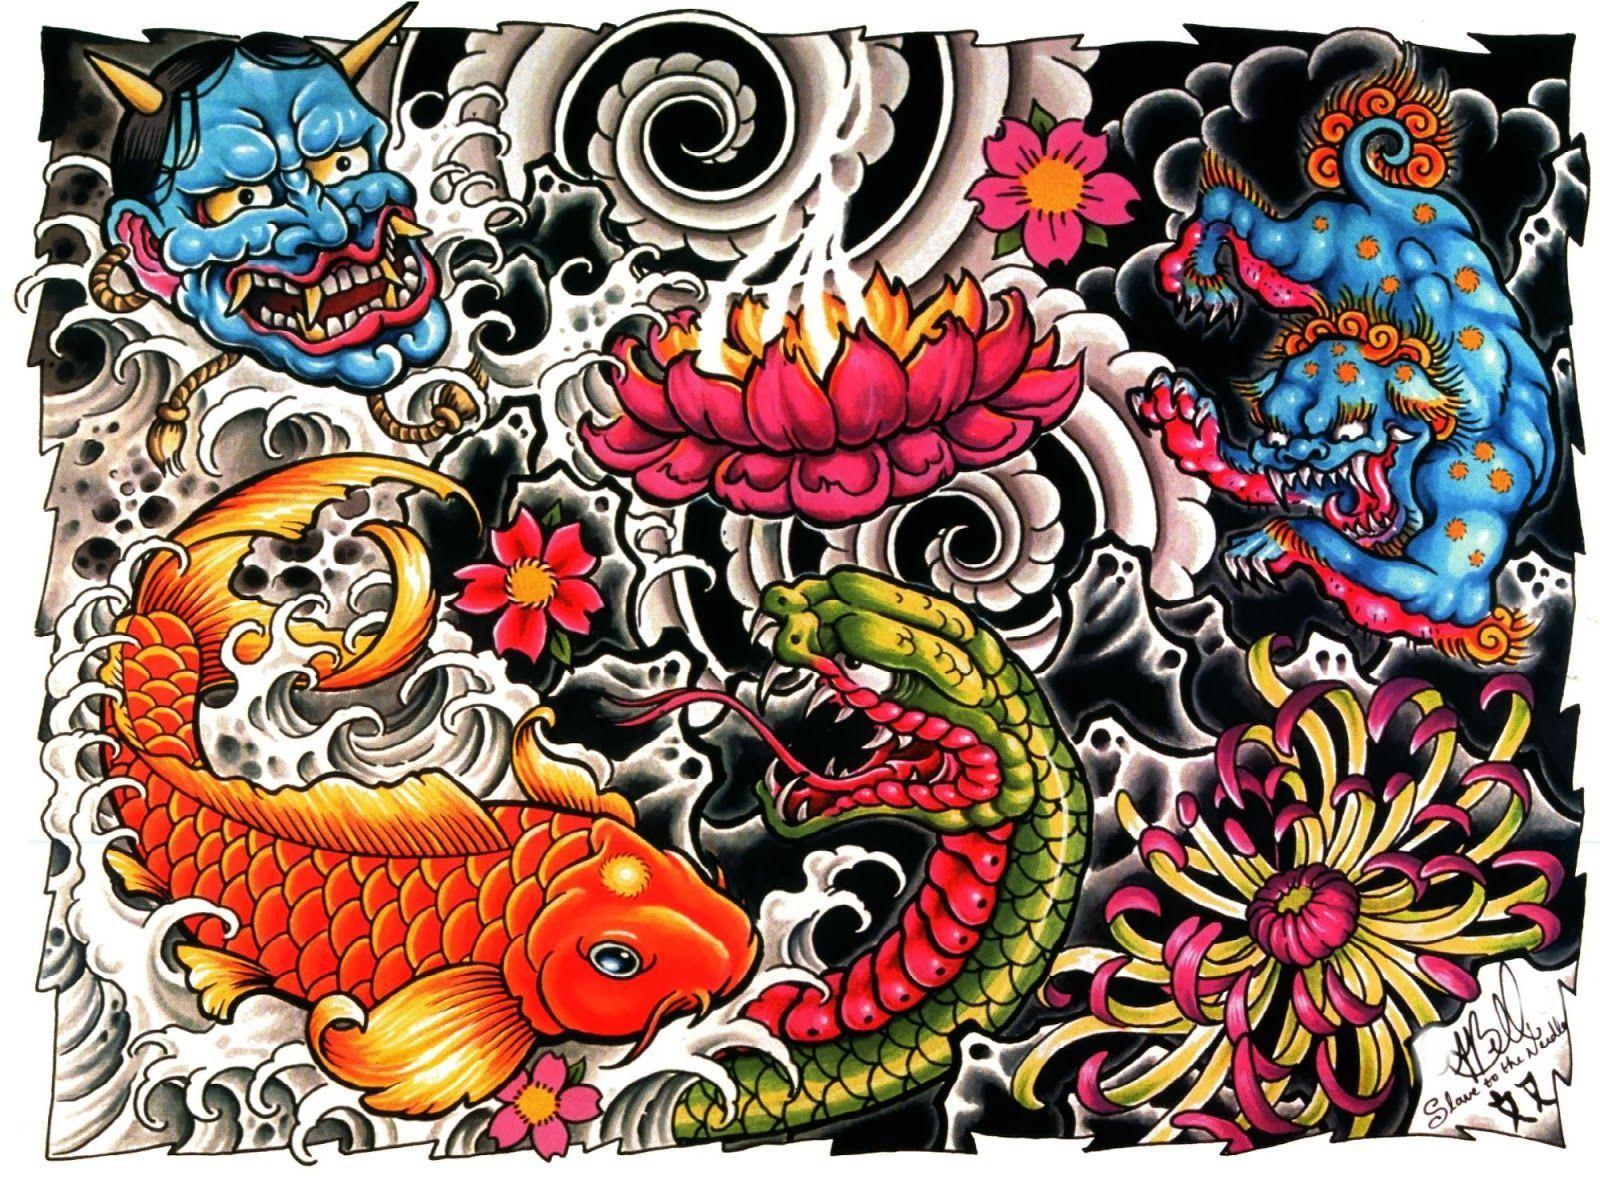 Tattoo Design Wallpapers - Wallpaper Cave - Art Background Tattoos ...